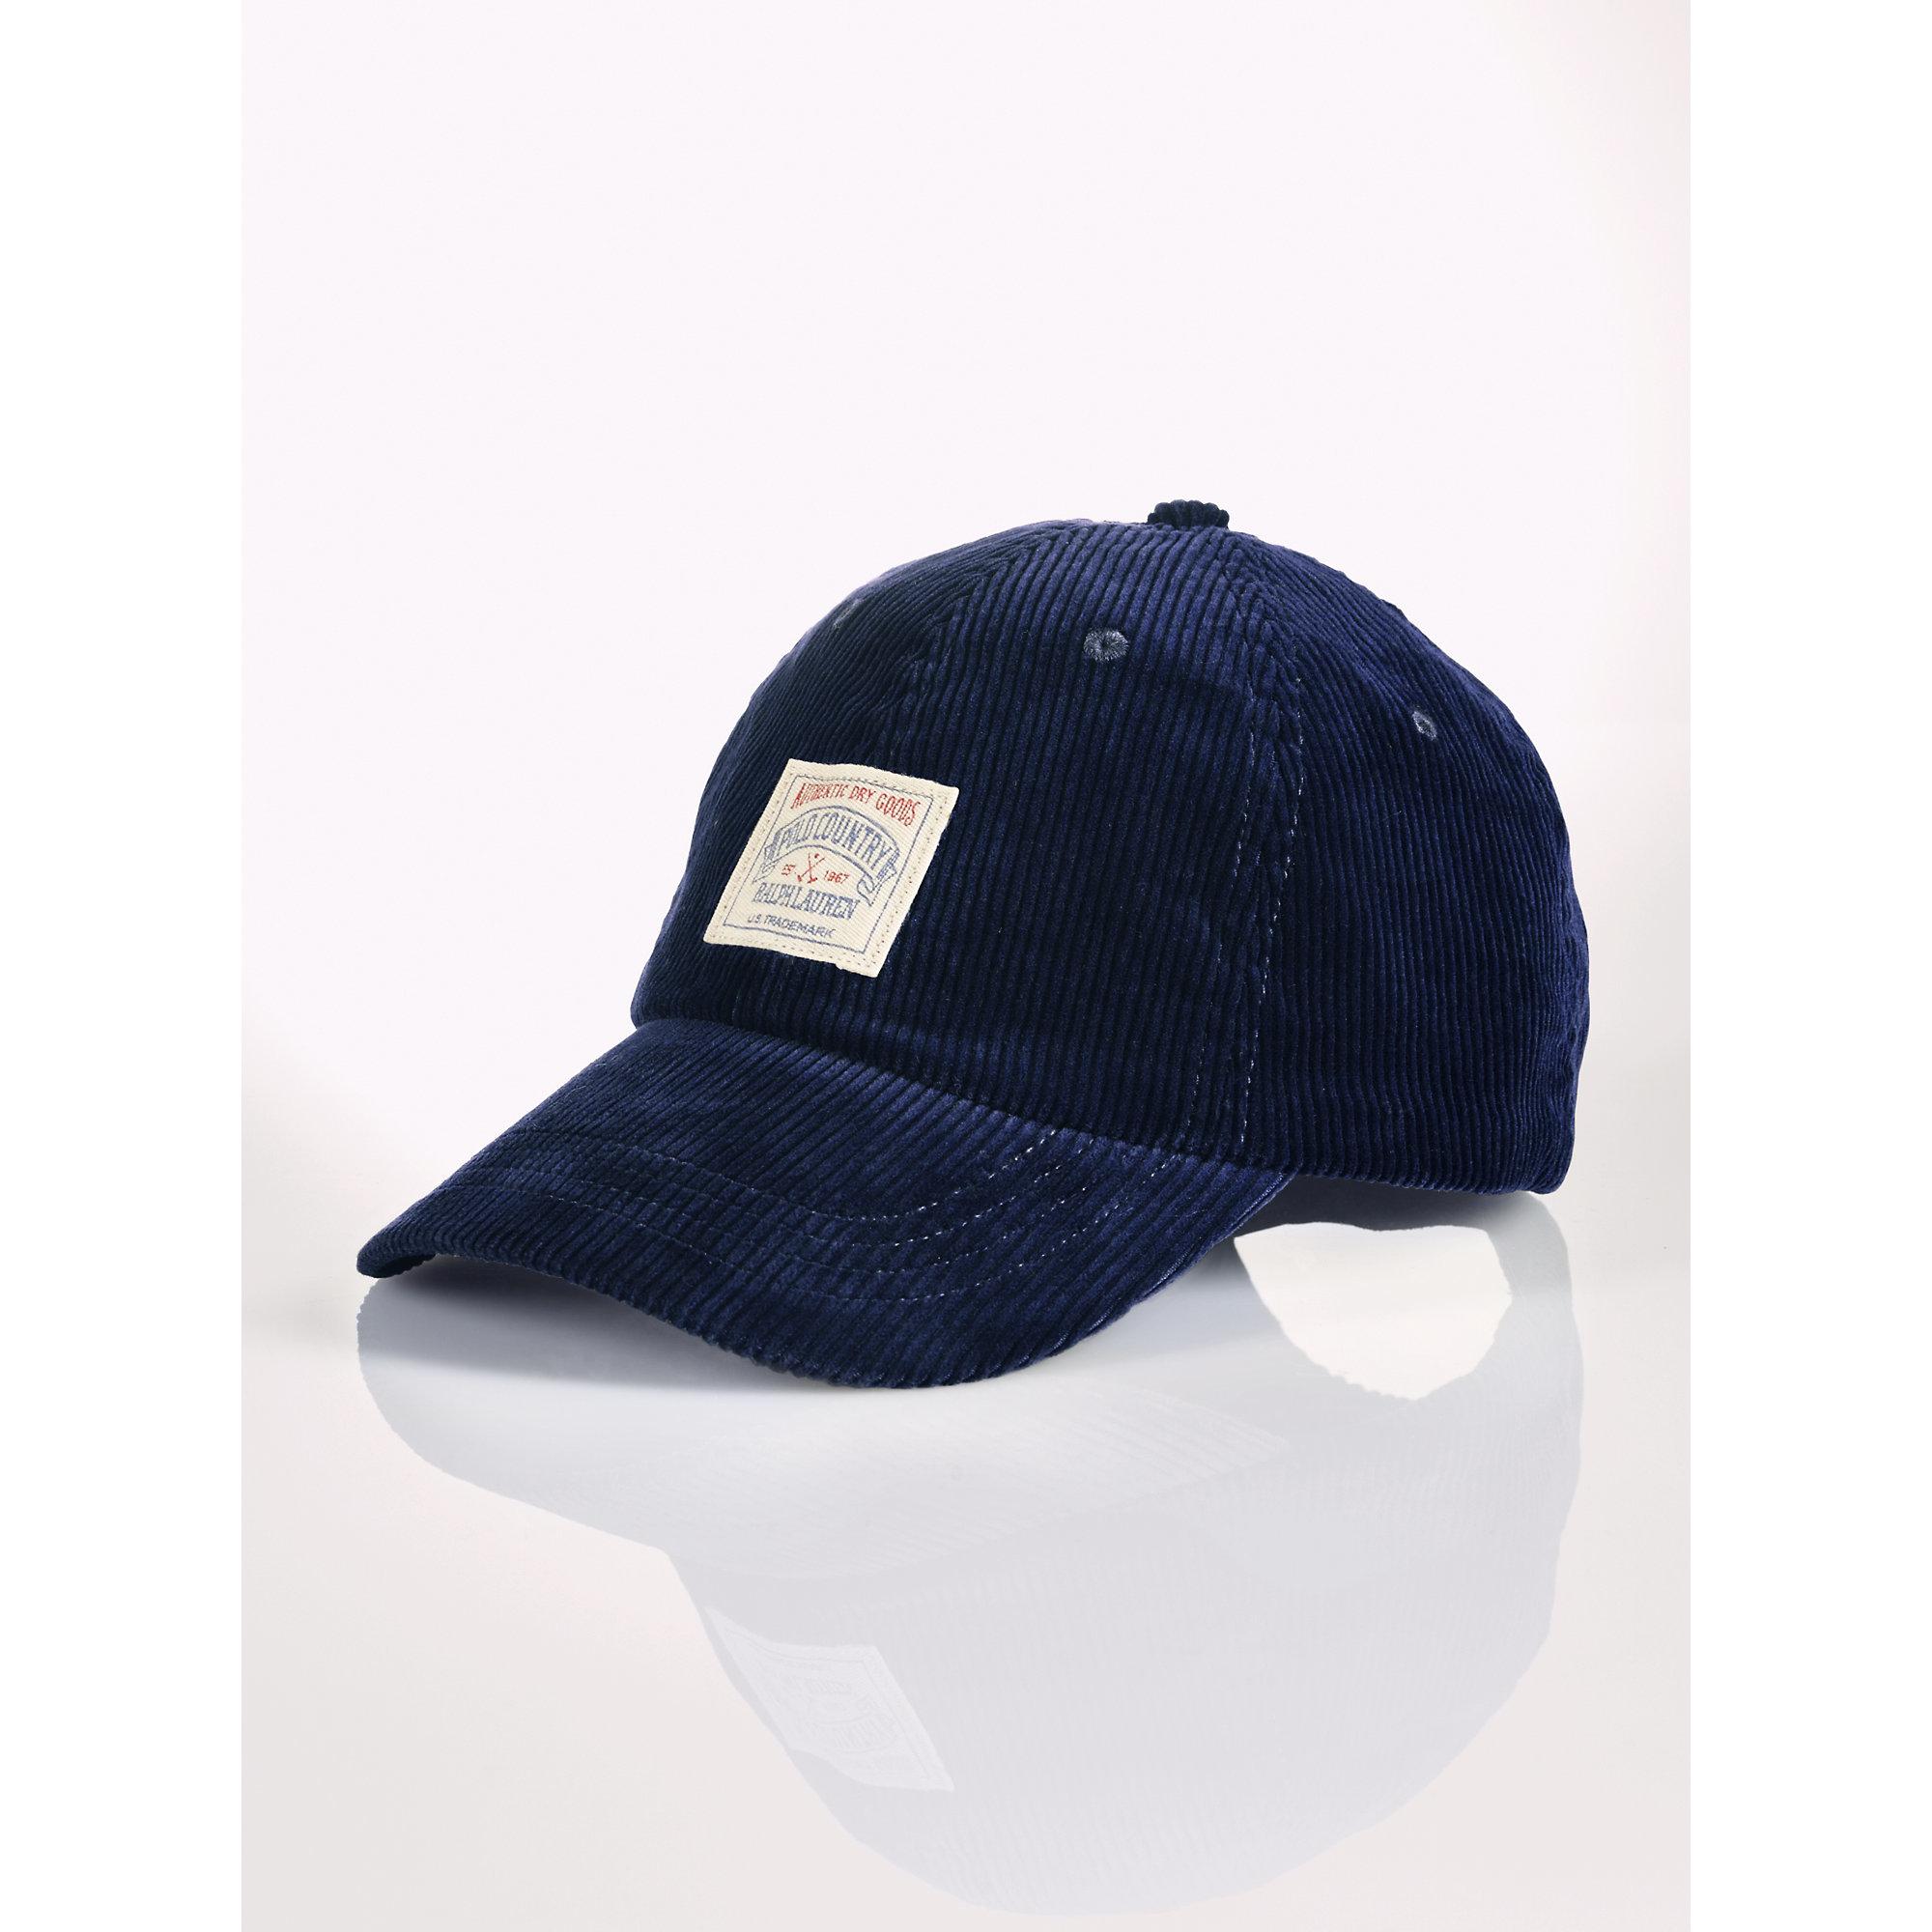 Lyst - Polo Ralph Lauren Corduroy Hat in Blue for Men 5ca2816f7c0